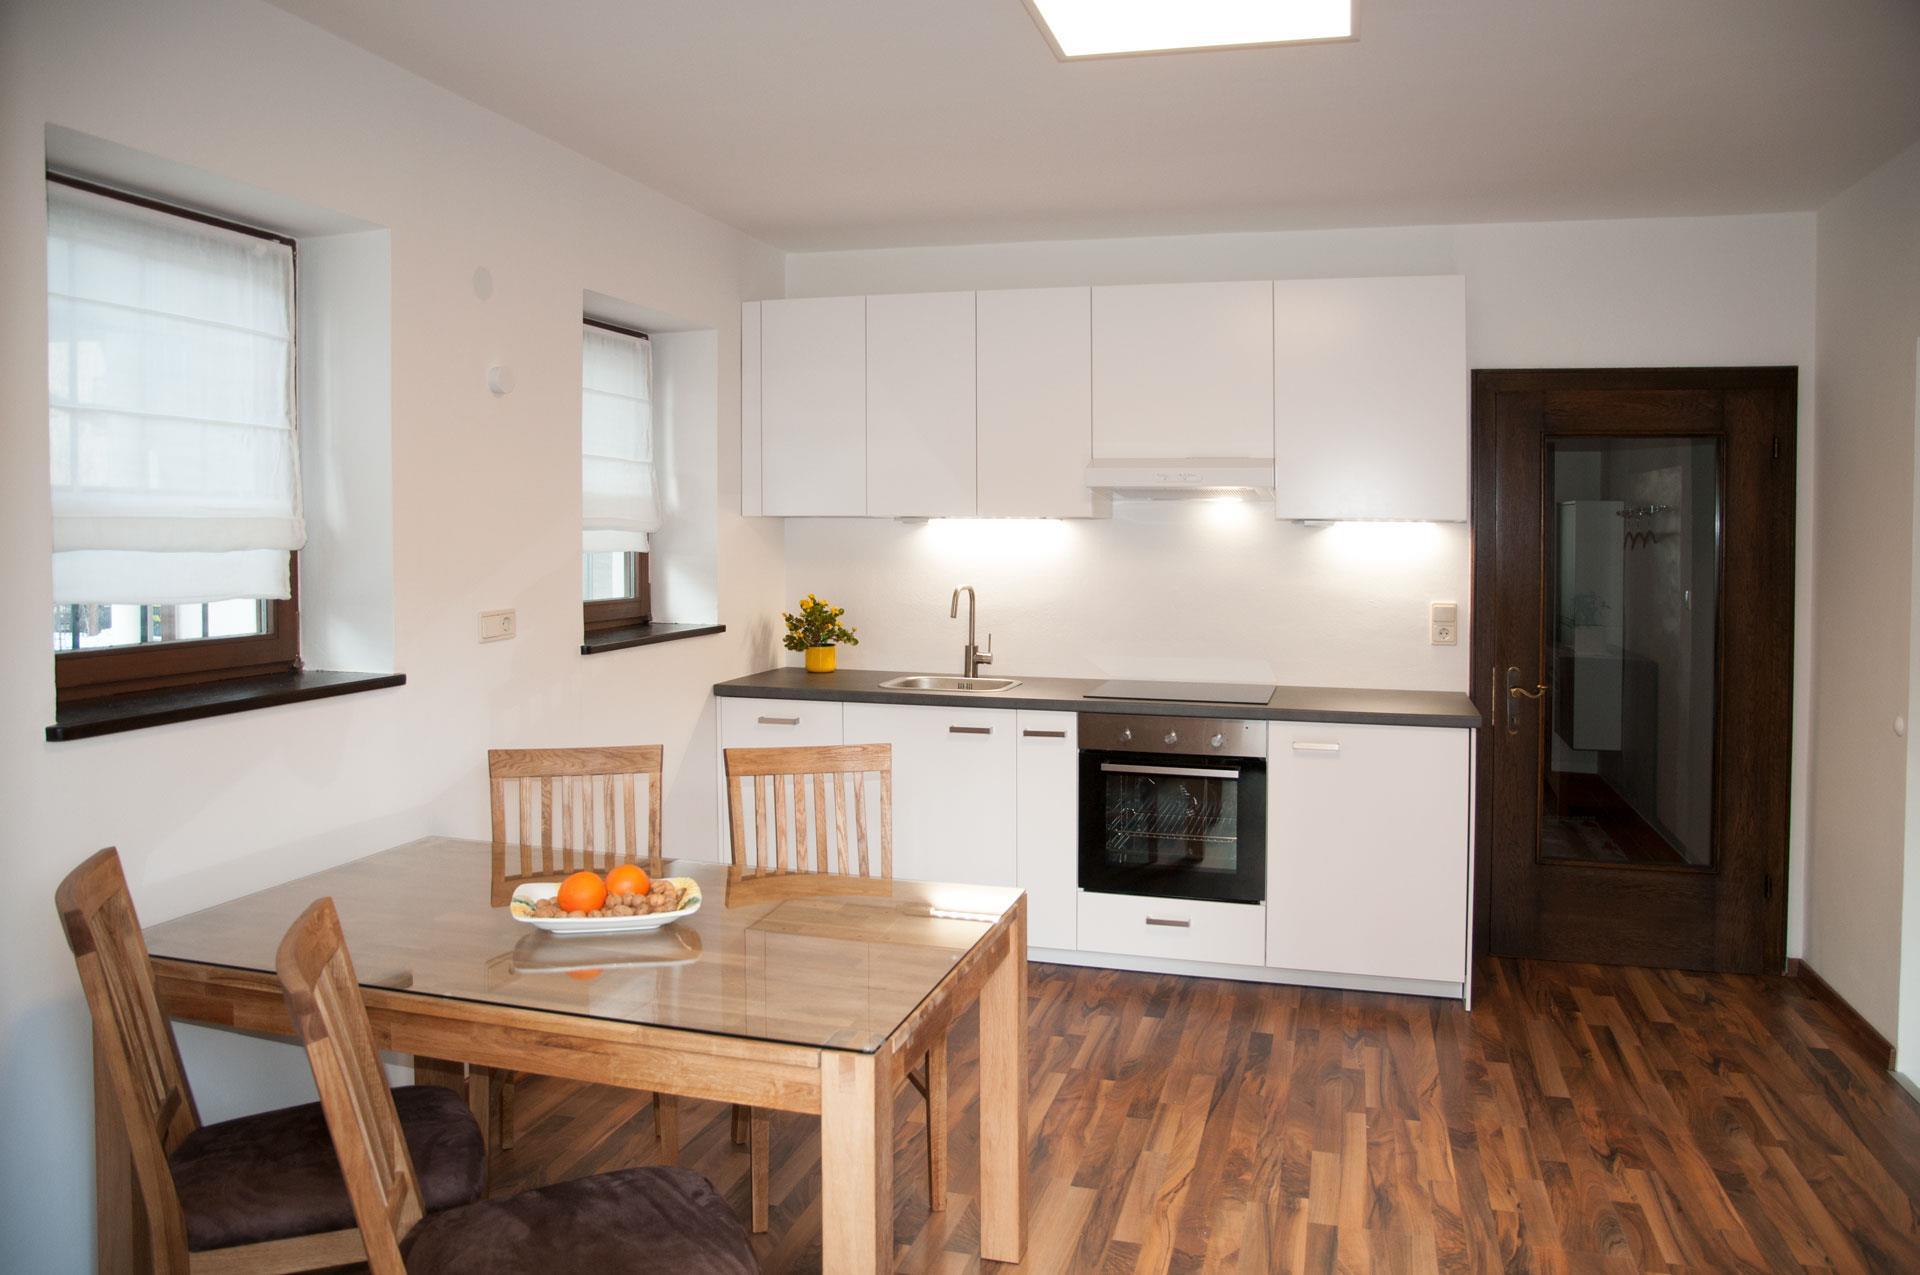 Apartment Kraus, Sterzing, Südtirol, Wohnküche